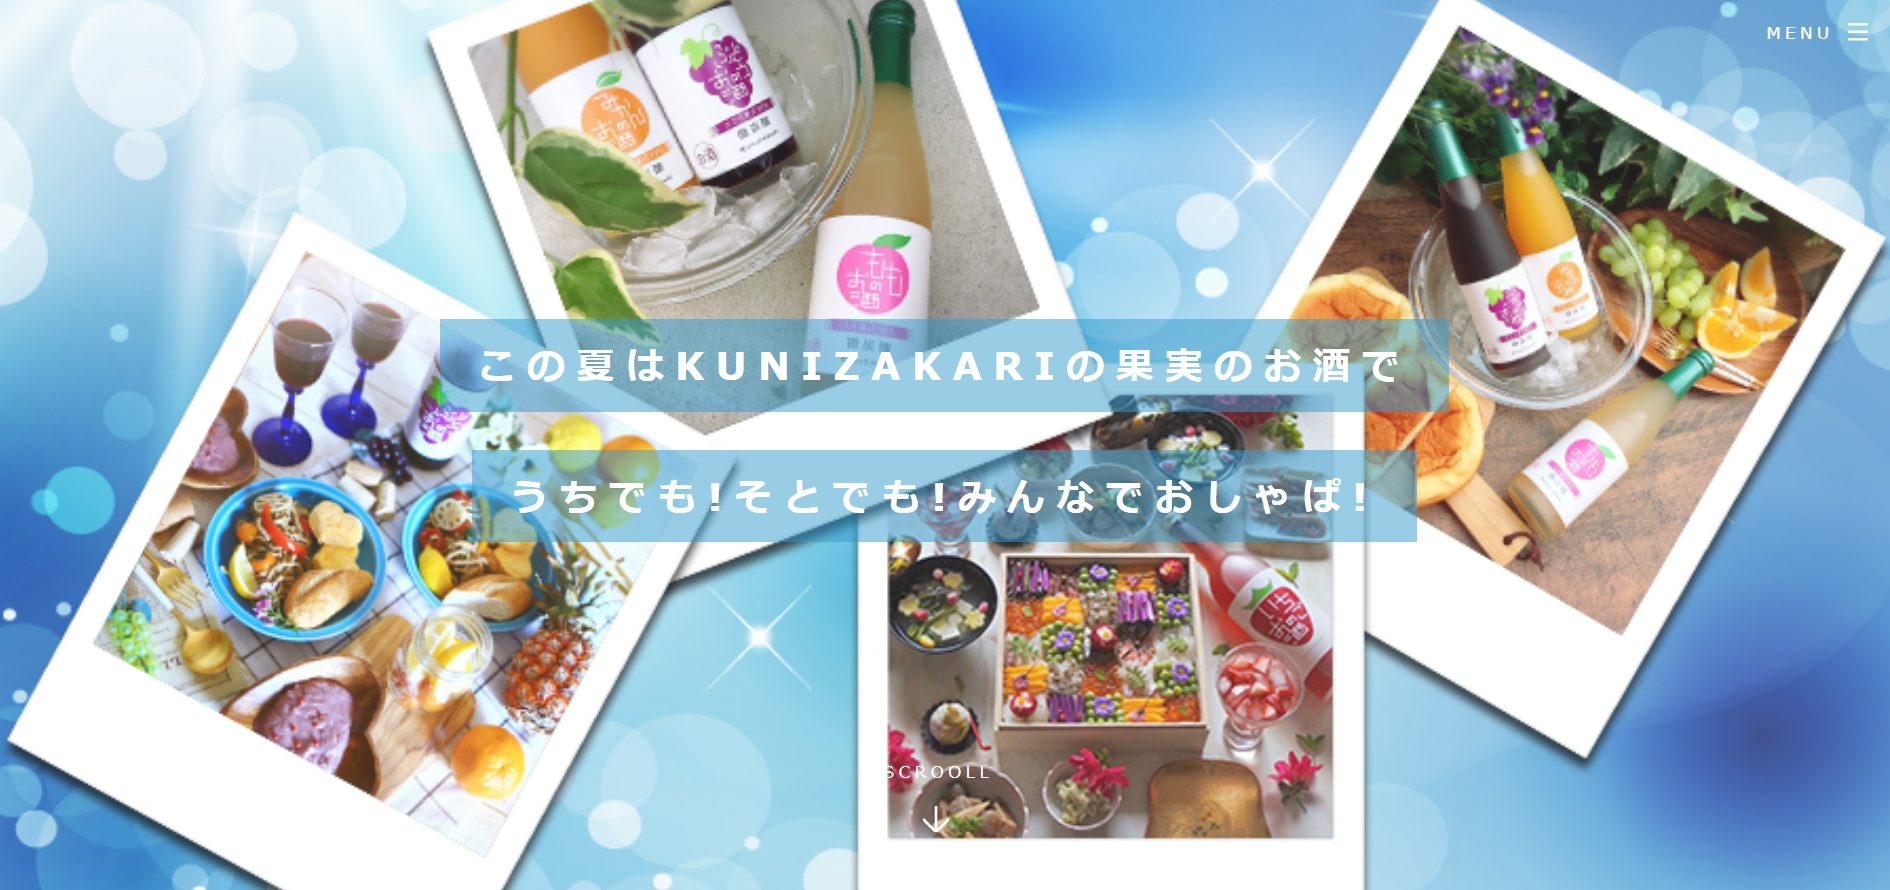 instagram-campaign-kunizakari